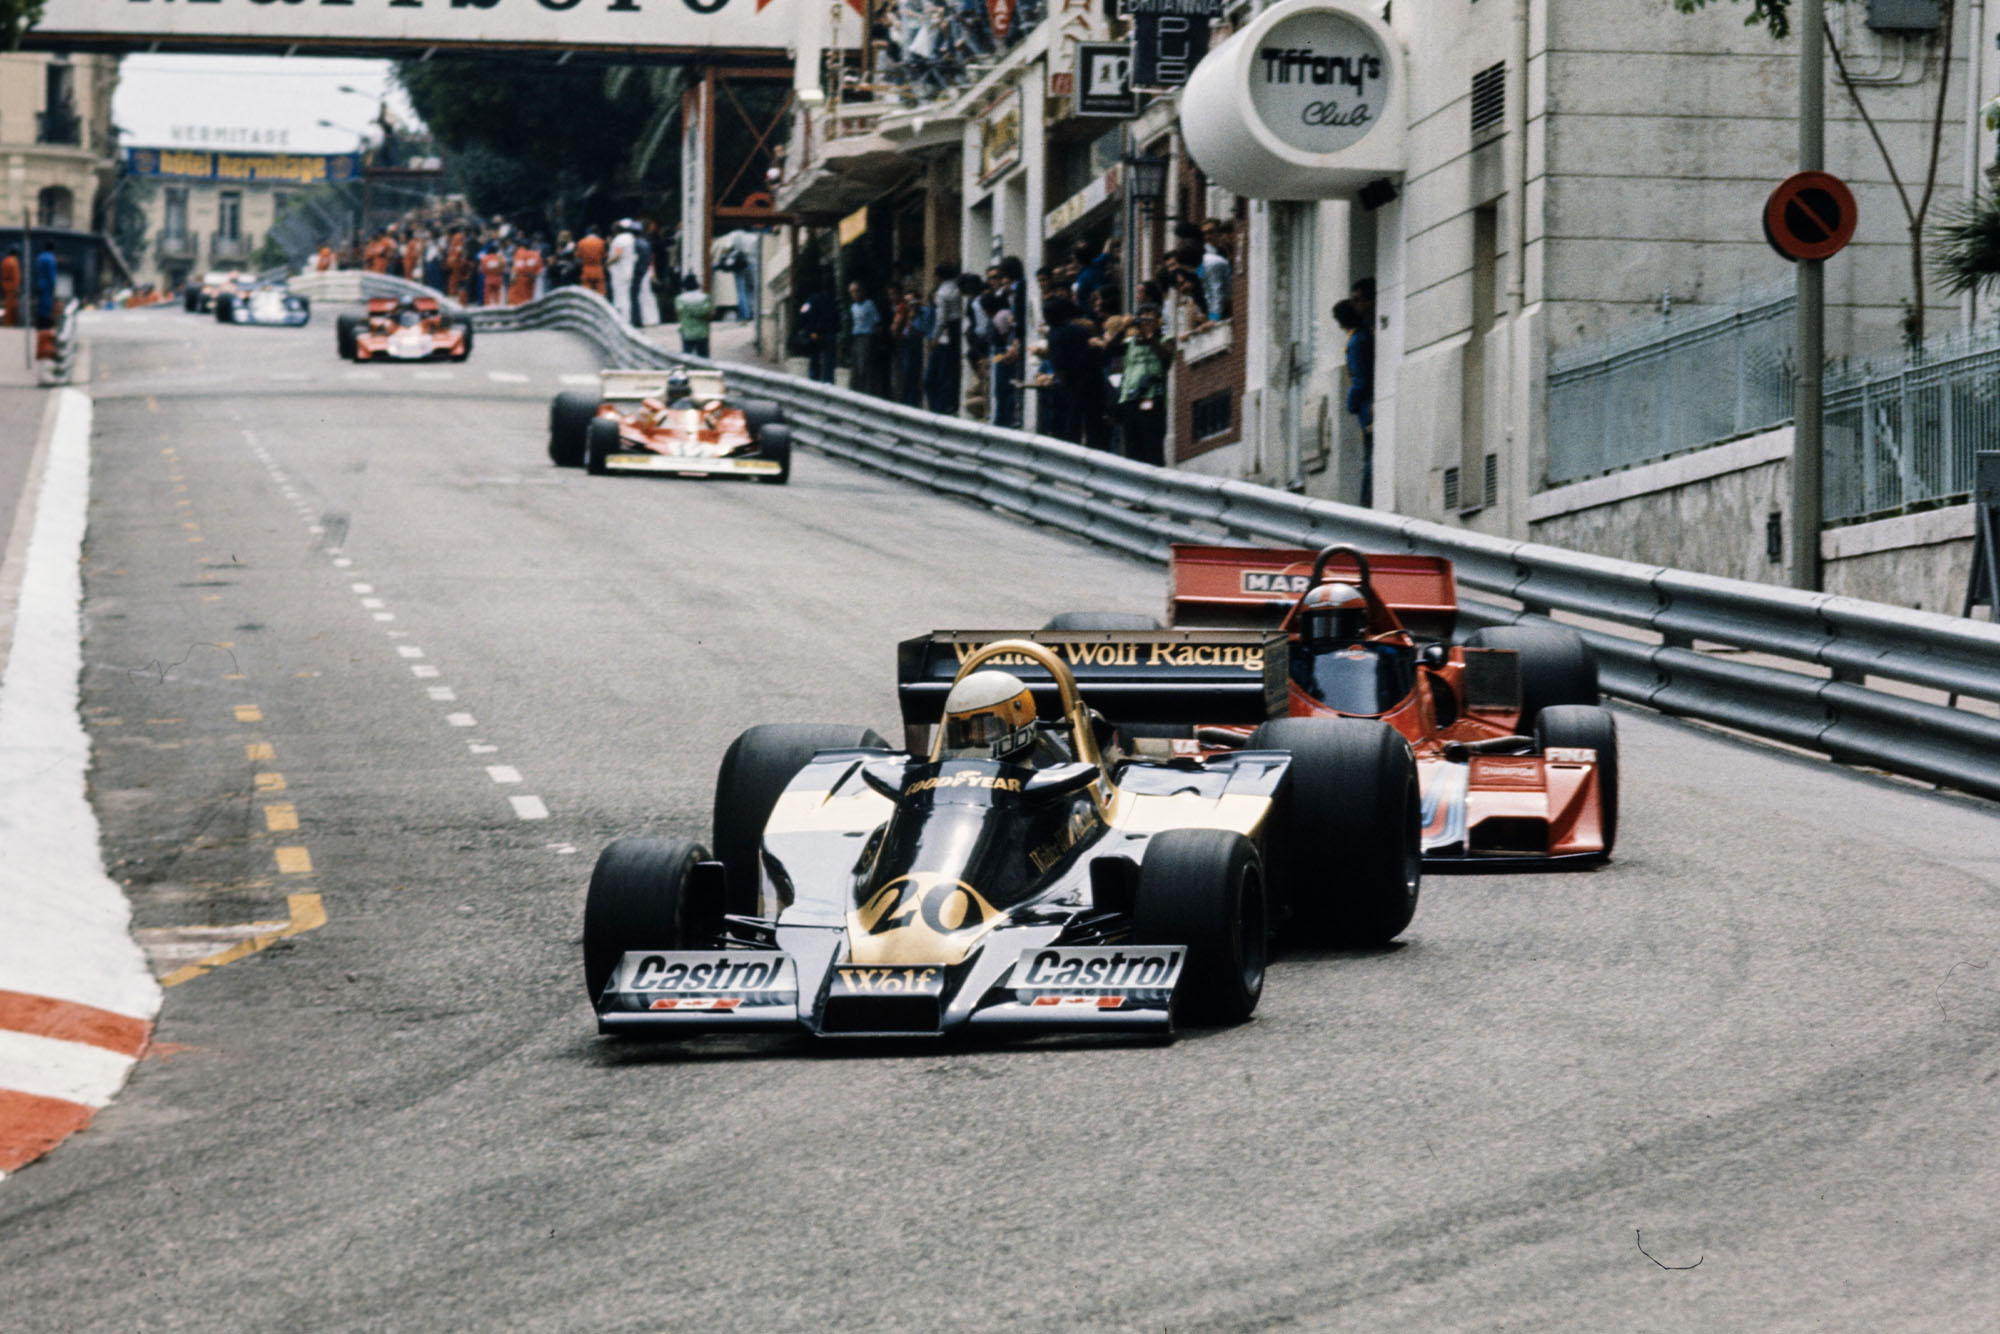 Jody Scheckter keeps his Wolf ahead of John Watson's Brabham at the 1978 Monaco Grand Prix.